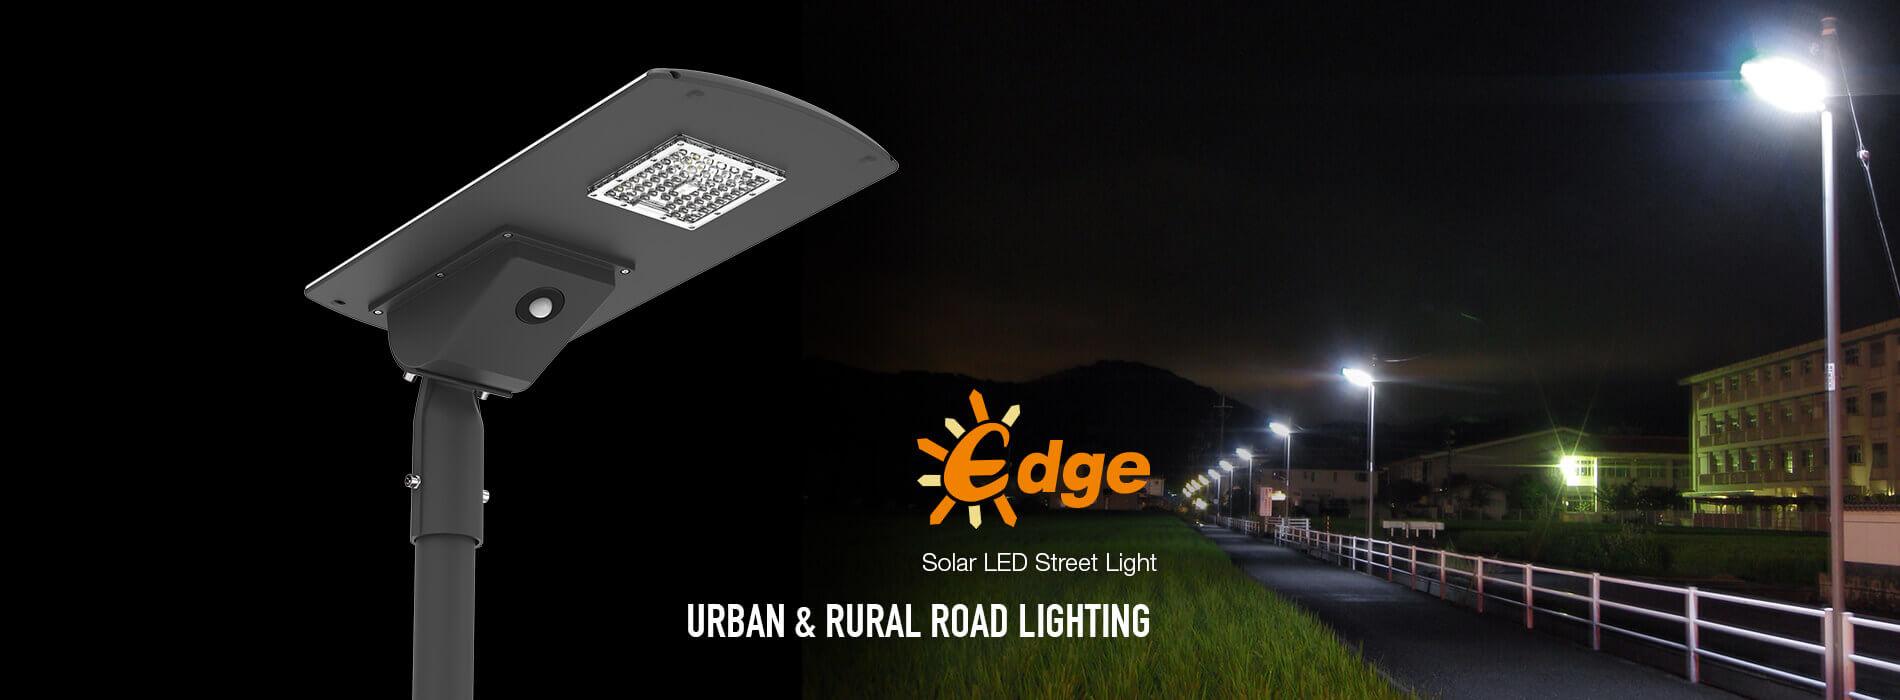 Edge solar street light